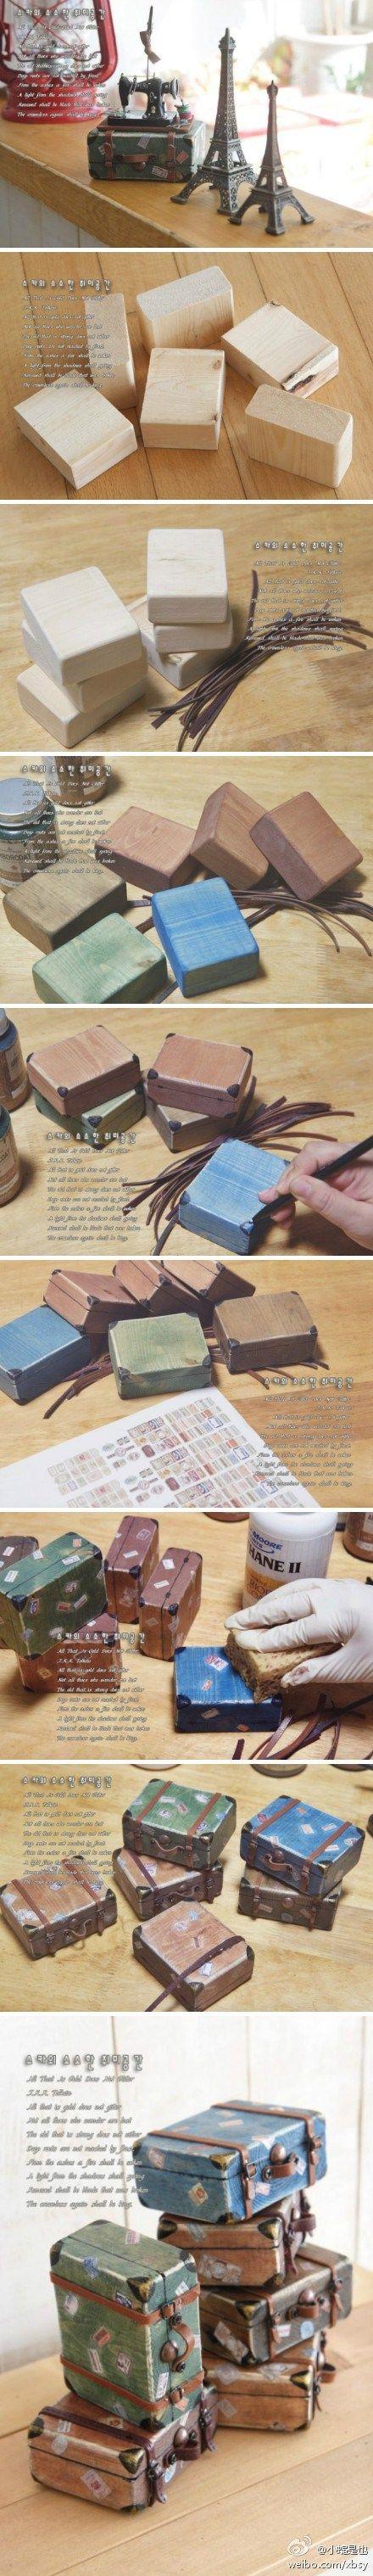 Level: easy // Kleine Koffer- DIY // Gesehen bei : http://brightnessproject.com/vintagesuitcasetuts/?trashed=1&ids=1